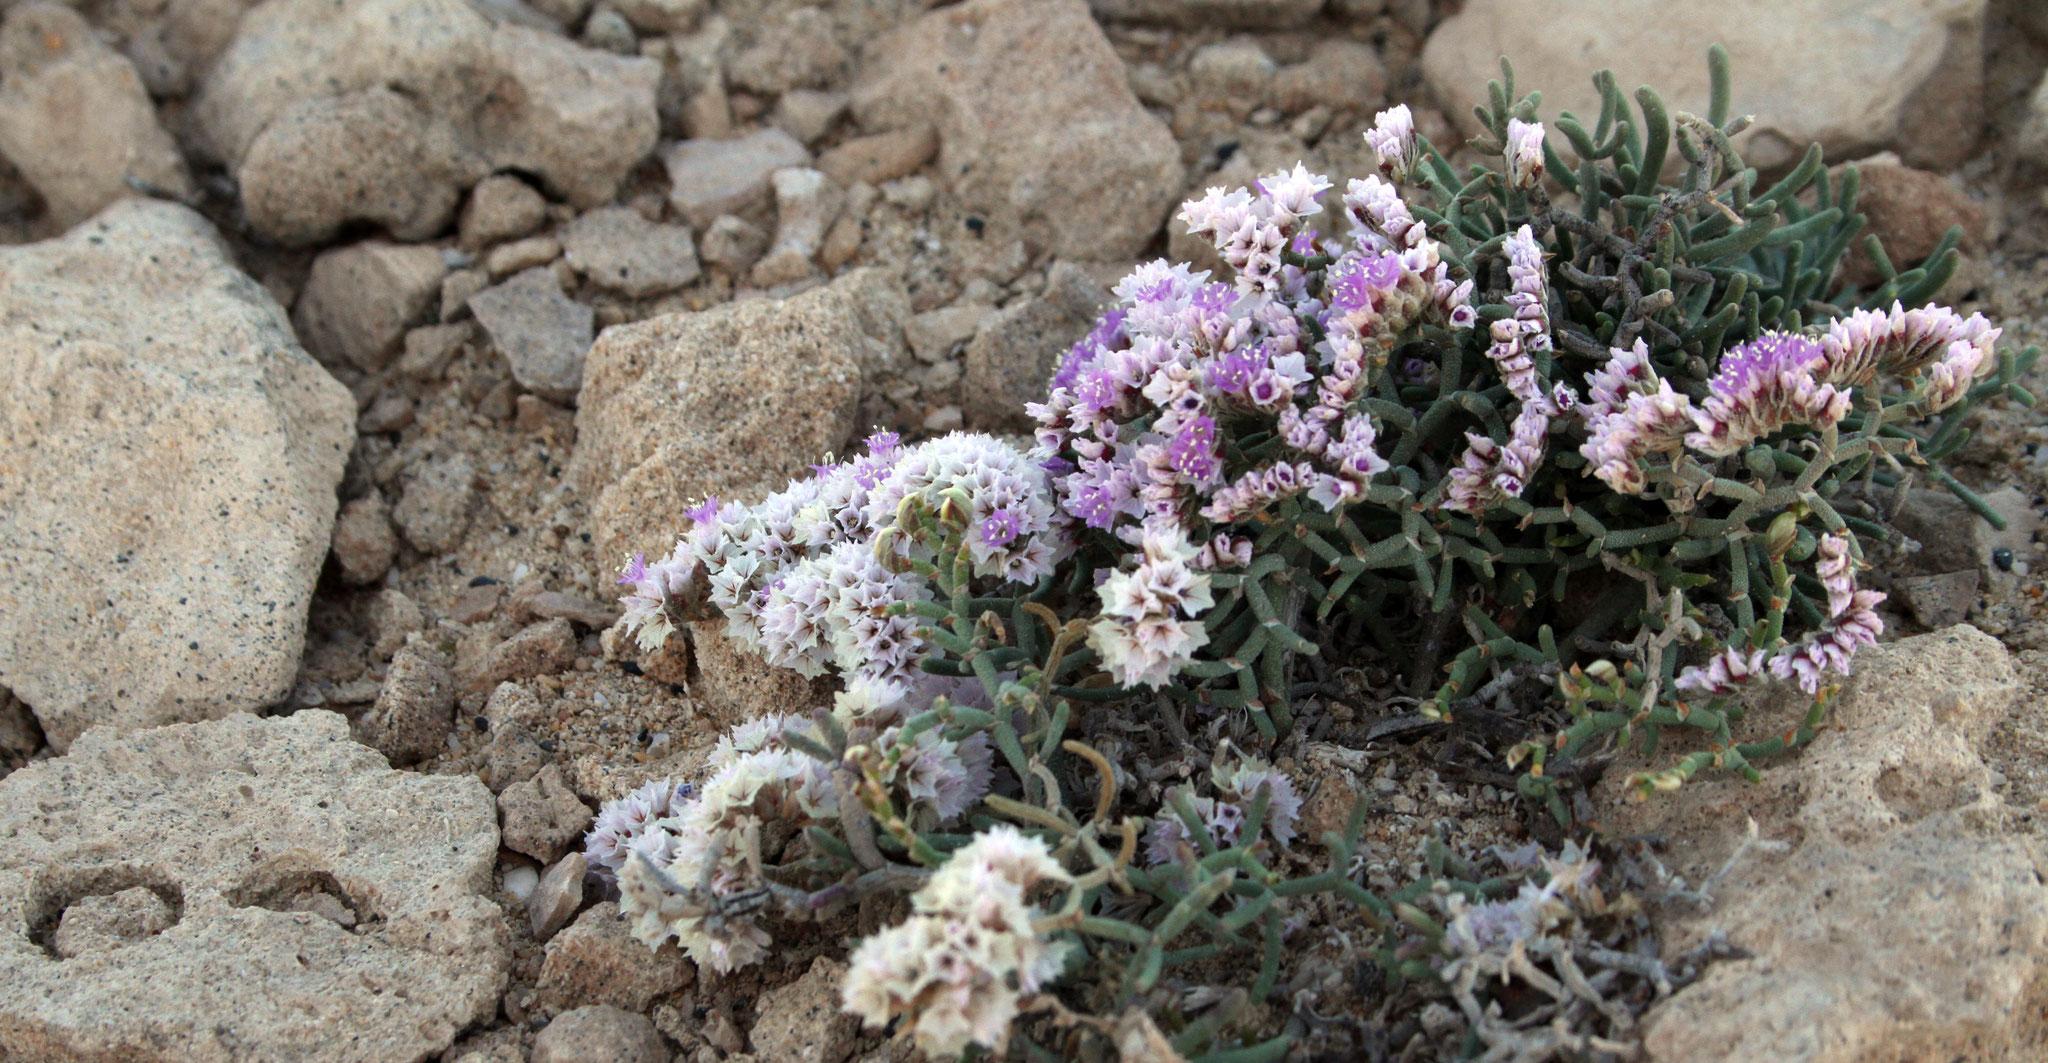 Kammförmiger Strandflieder (Limonium pectinatum)